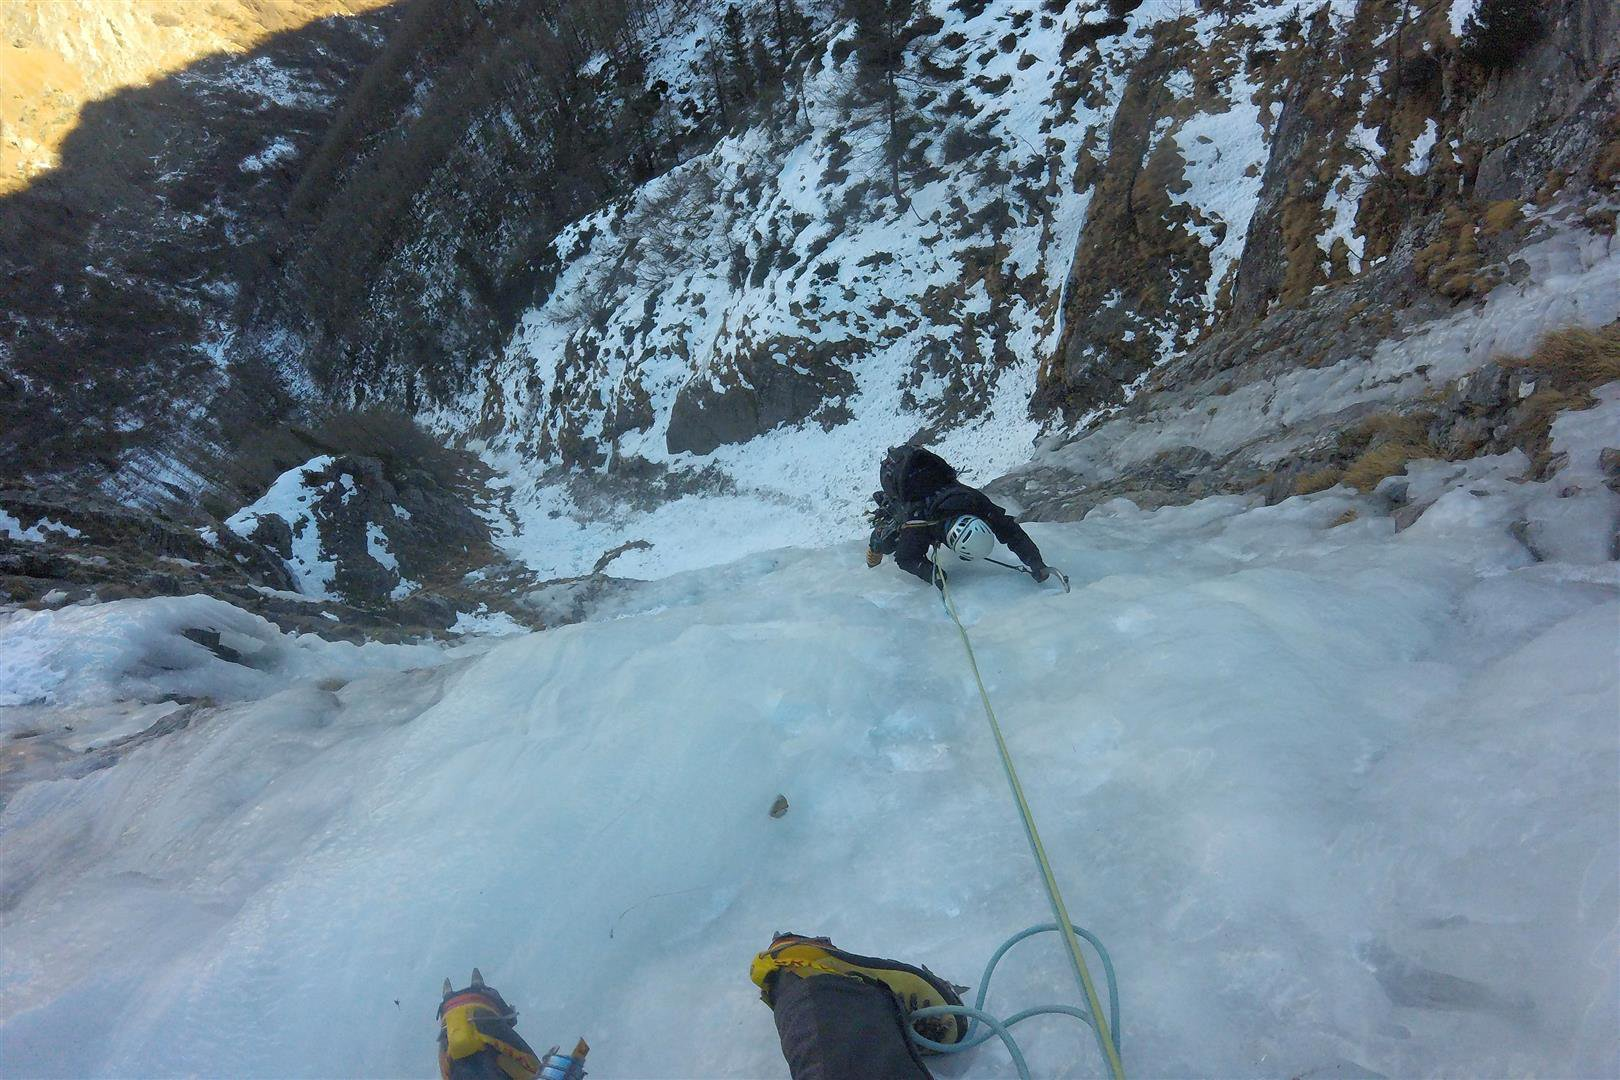 Val Chisone Rocca Bruna (Cascata) 2017-01-03